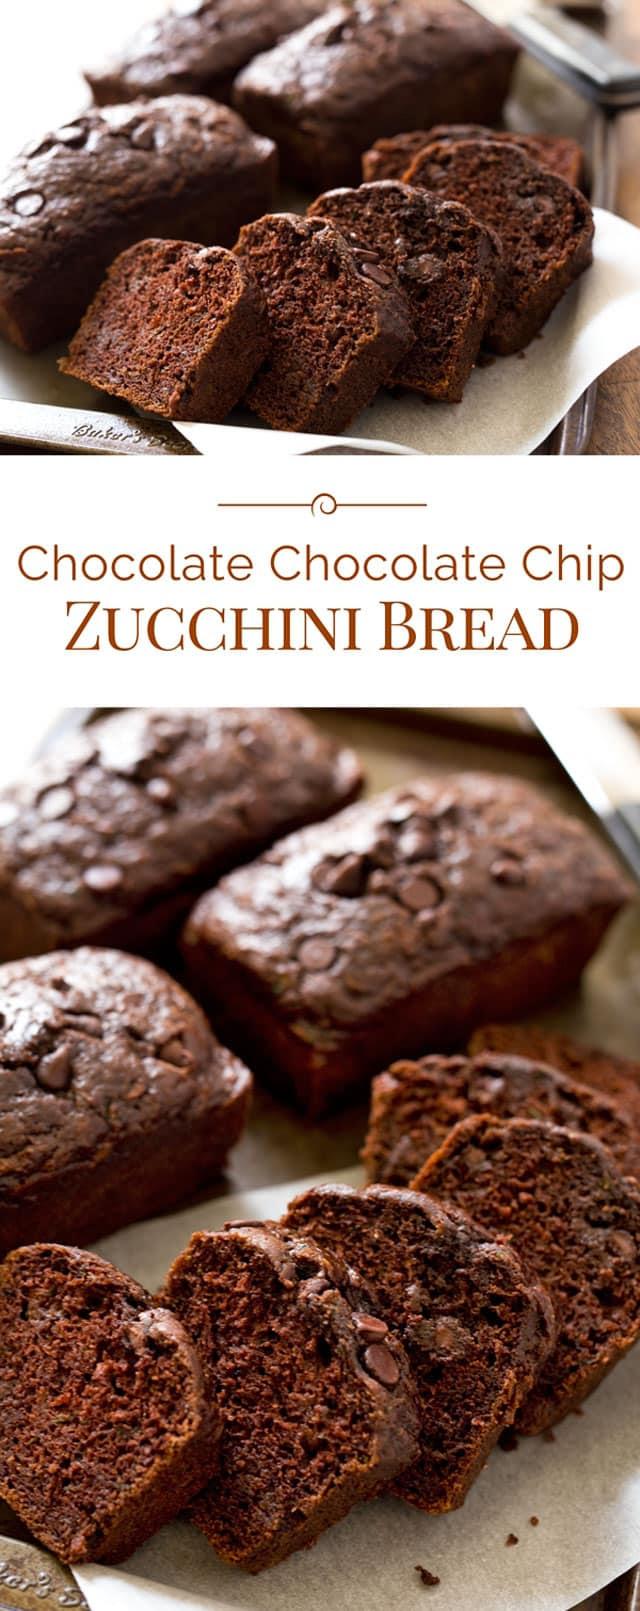 Chocolate Chocolate Chip Zucchini Bread - Barbara Bakes